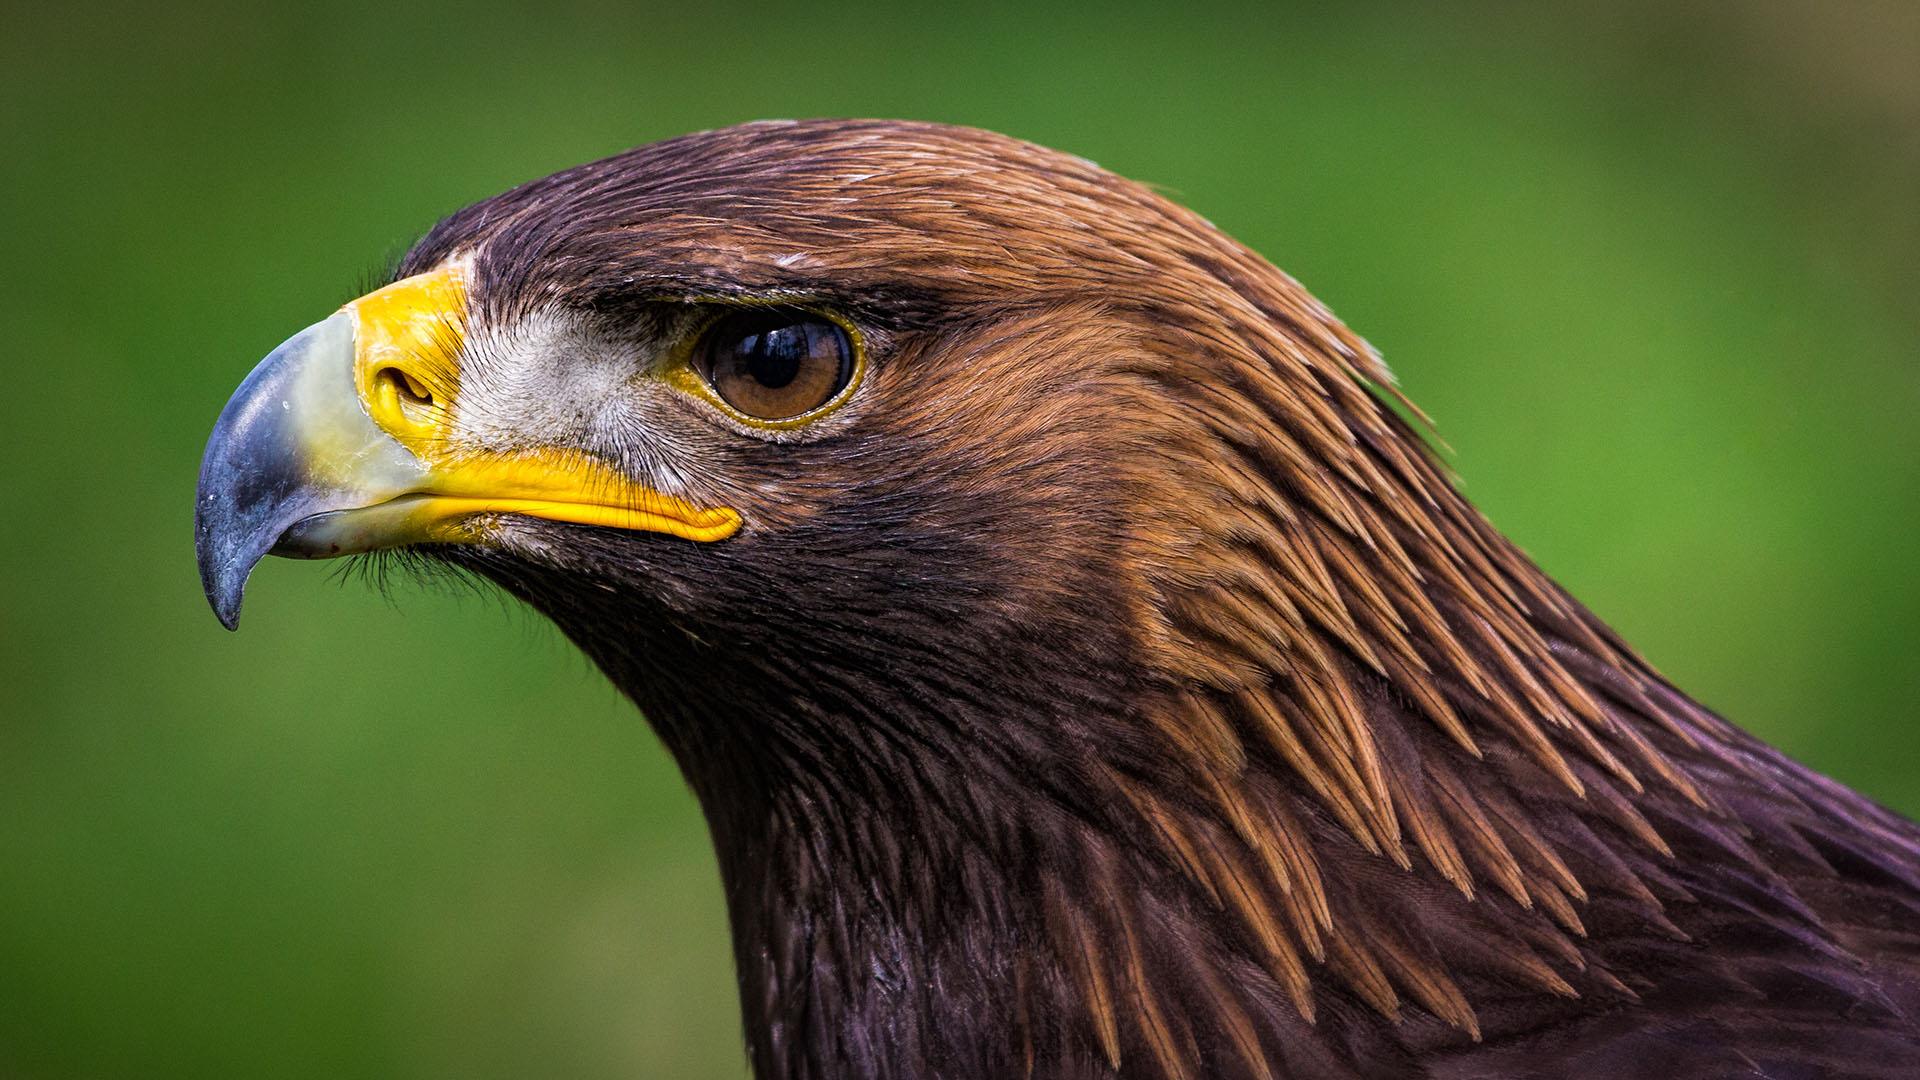 Steinadler (Aquila chrysaetos) by Michael Weidemann / Animals - 2015 ... Street